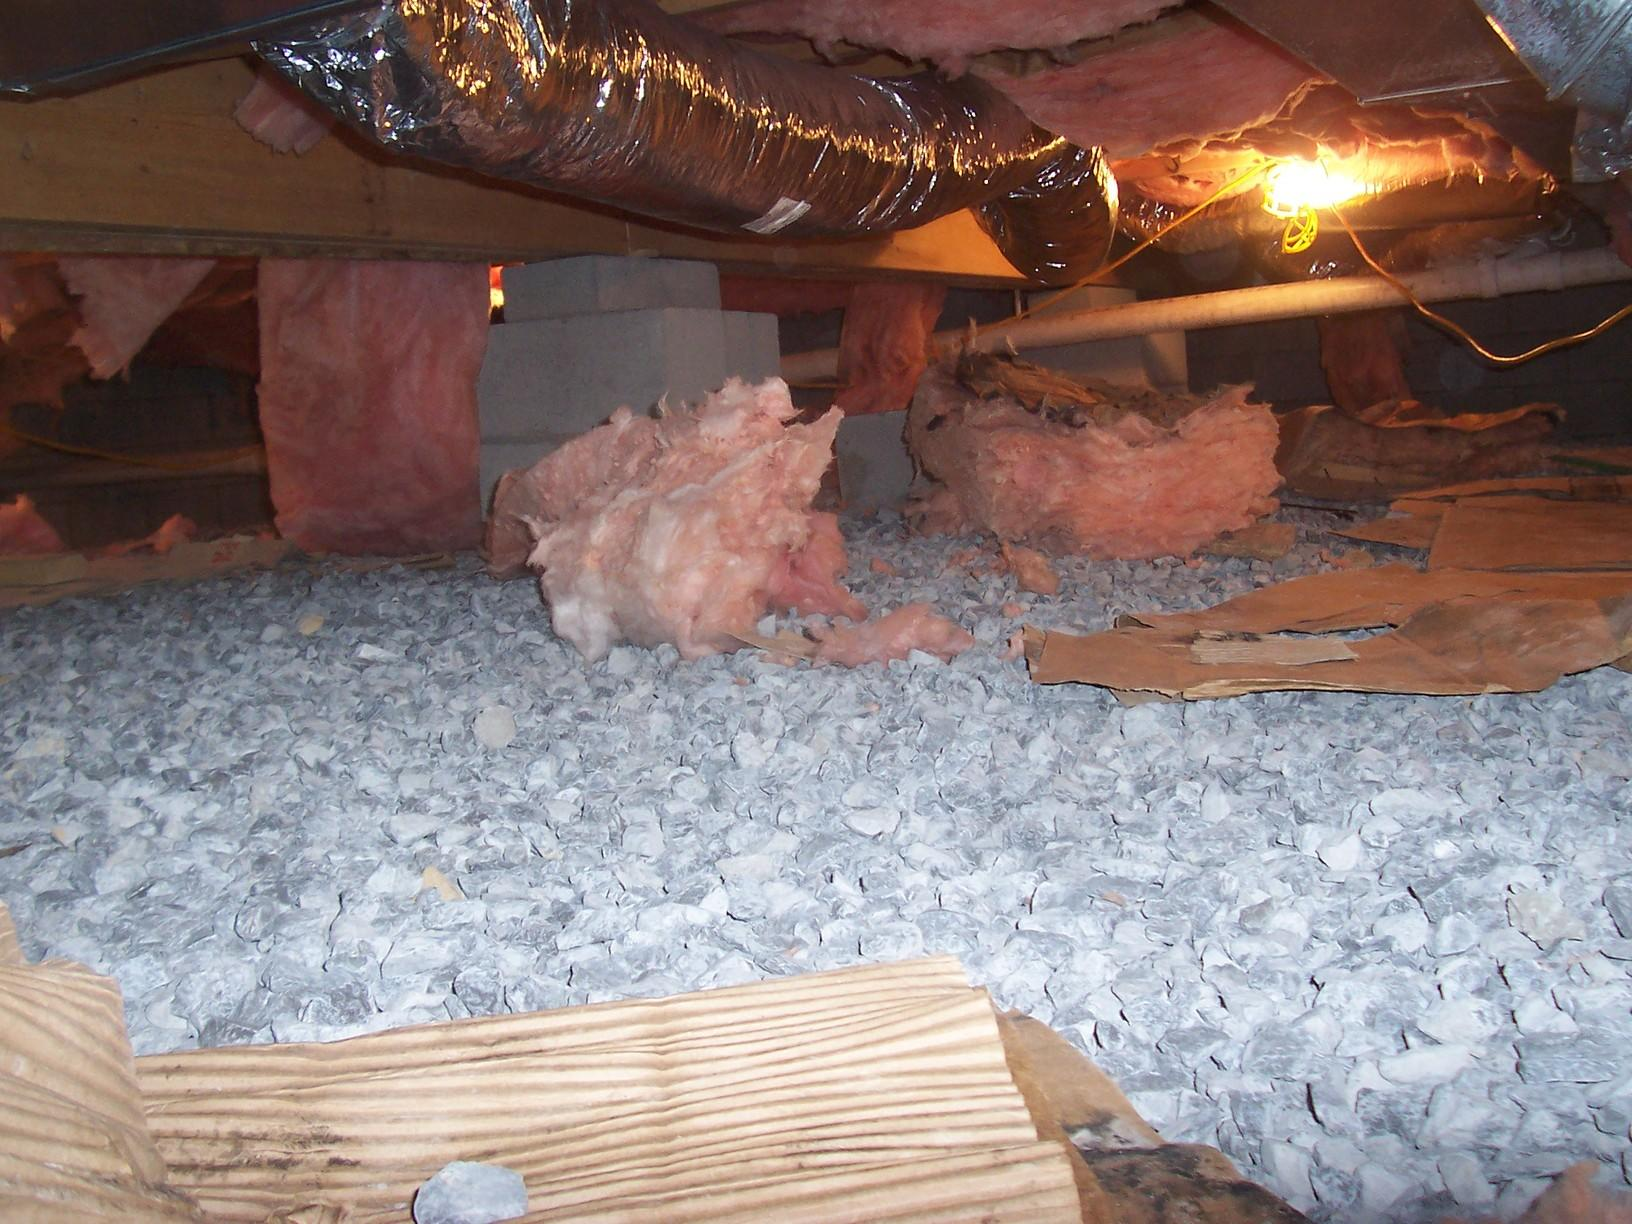 Dirty Crawl Space